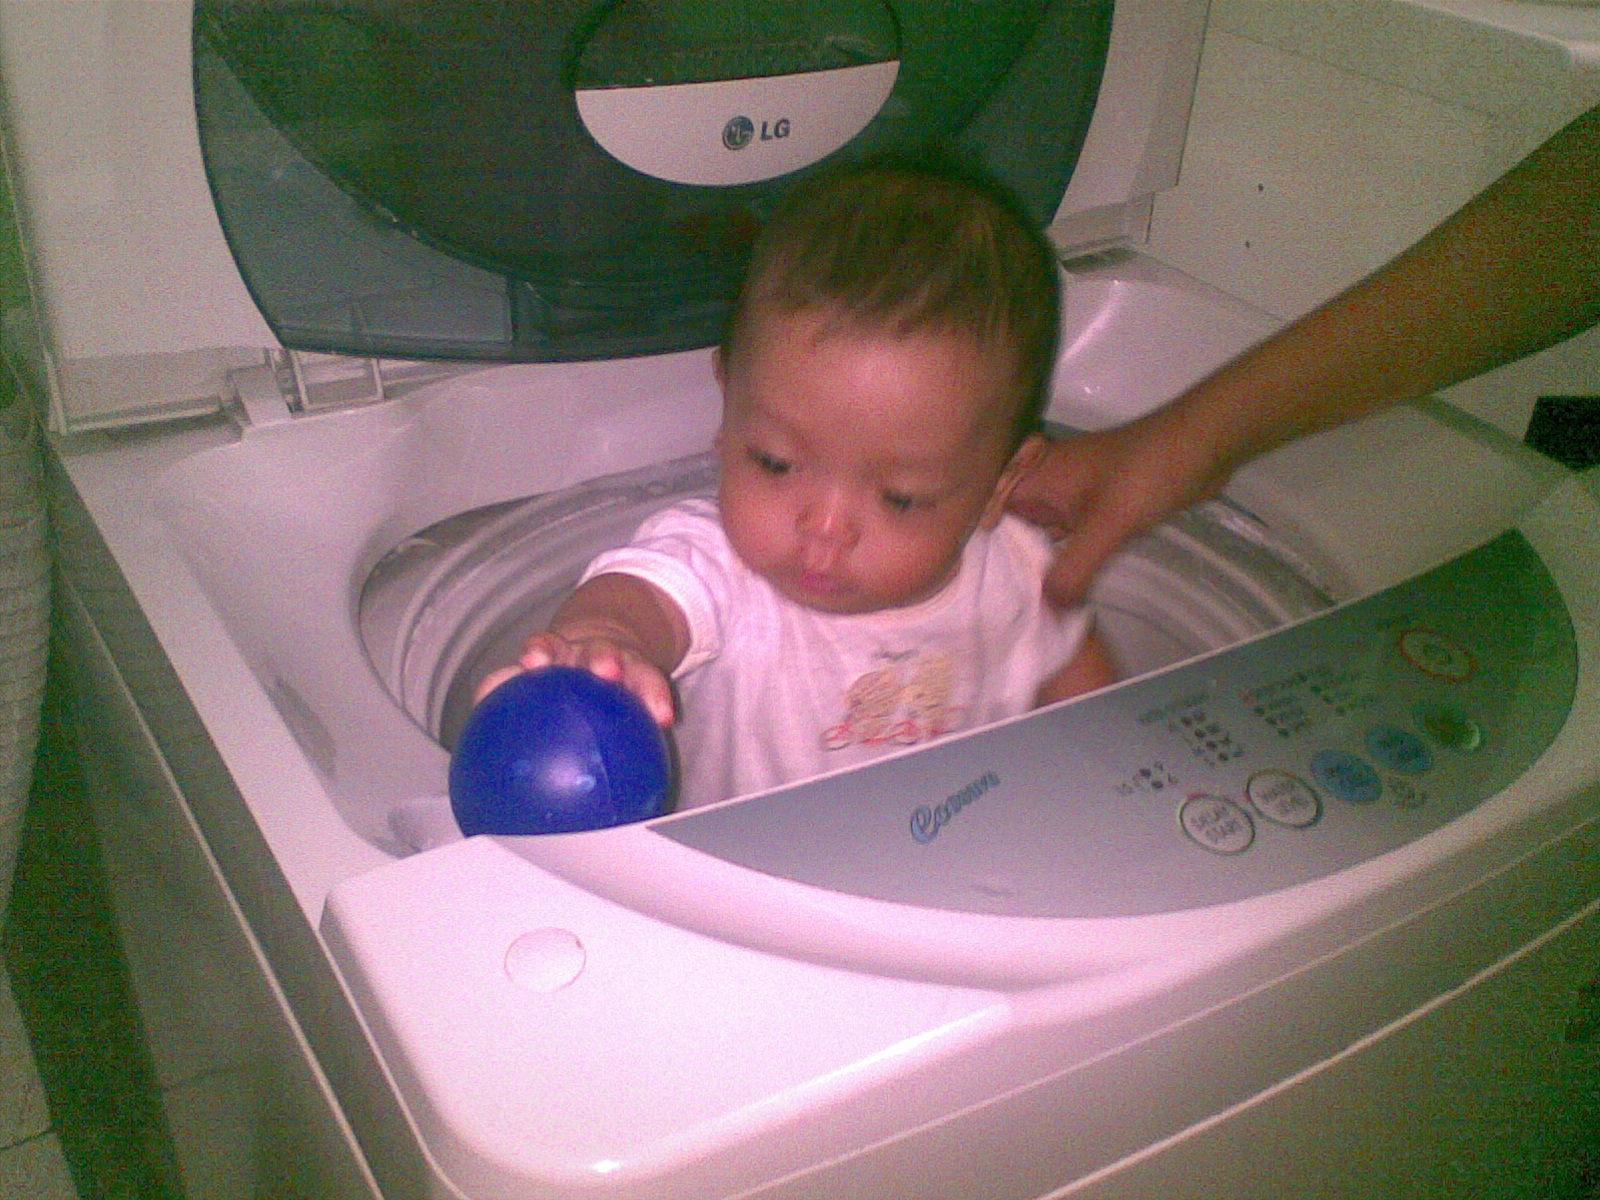 bokep anak kecil 08 Masuk ke mesin cuci (tante yang jahat)